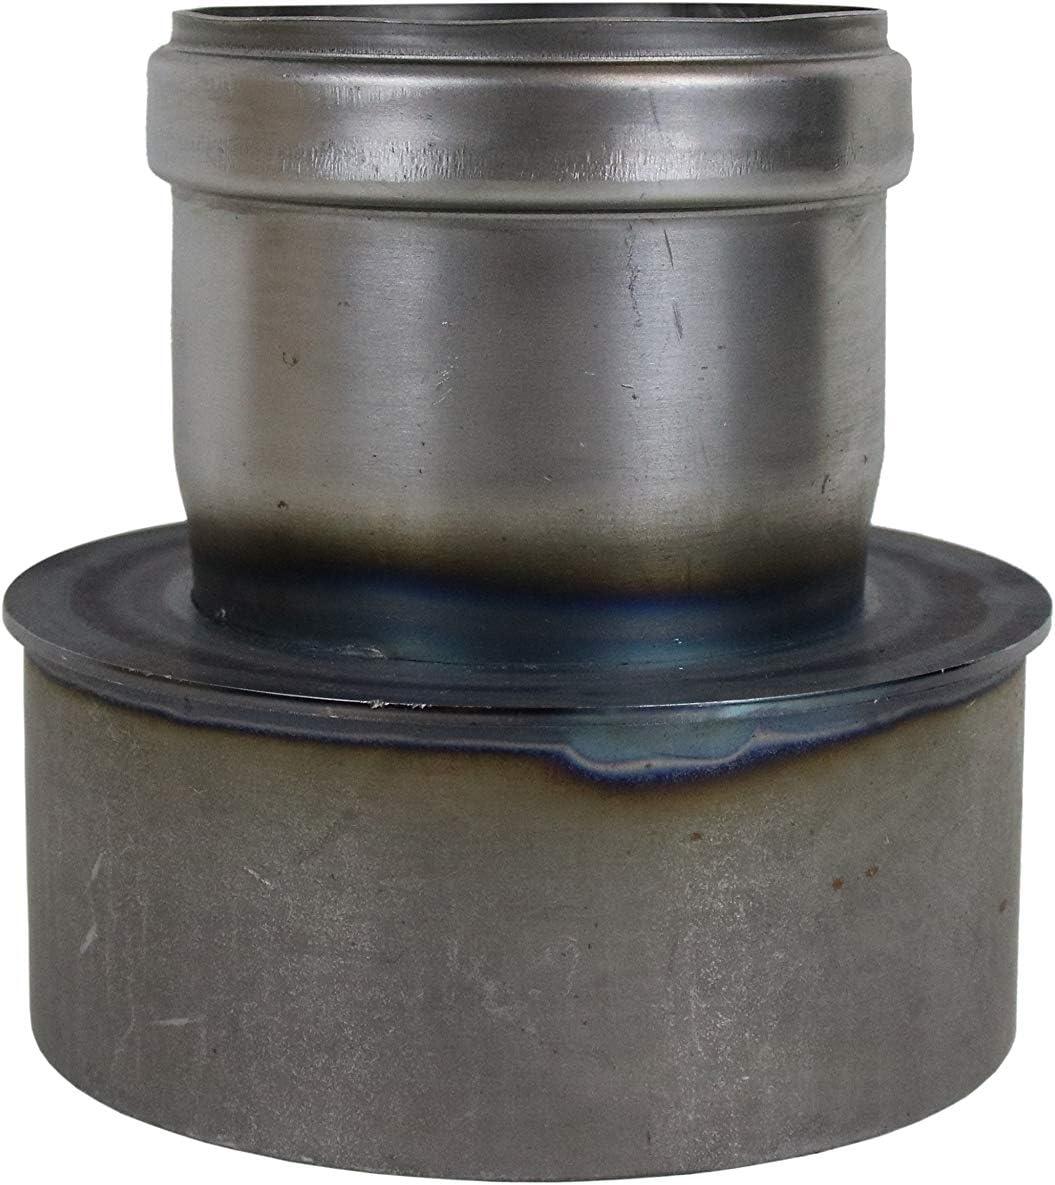 Pellet Tubo estufa de pellets codo para tubo de chimenea Ampliaci/ón de 80/mm de di/ámetro en 120/mm Gris Negro sin lacar